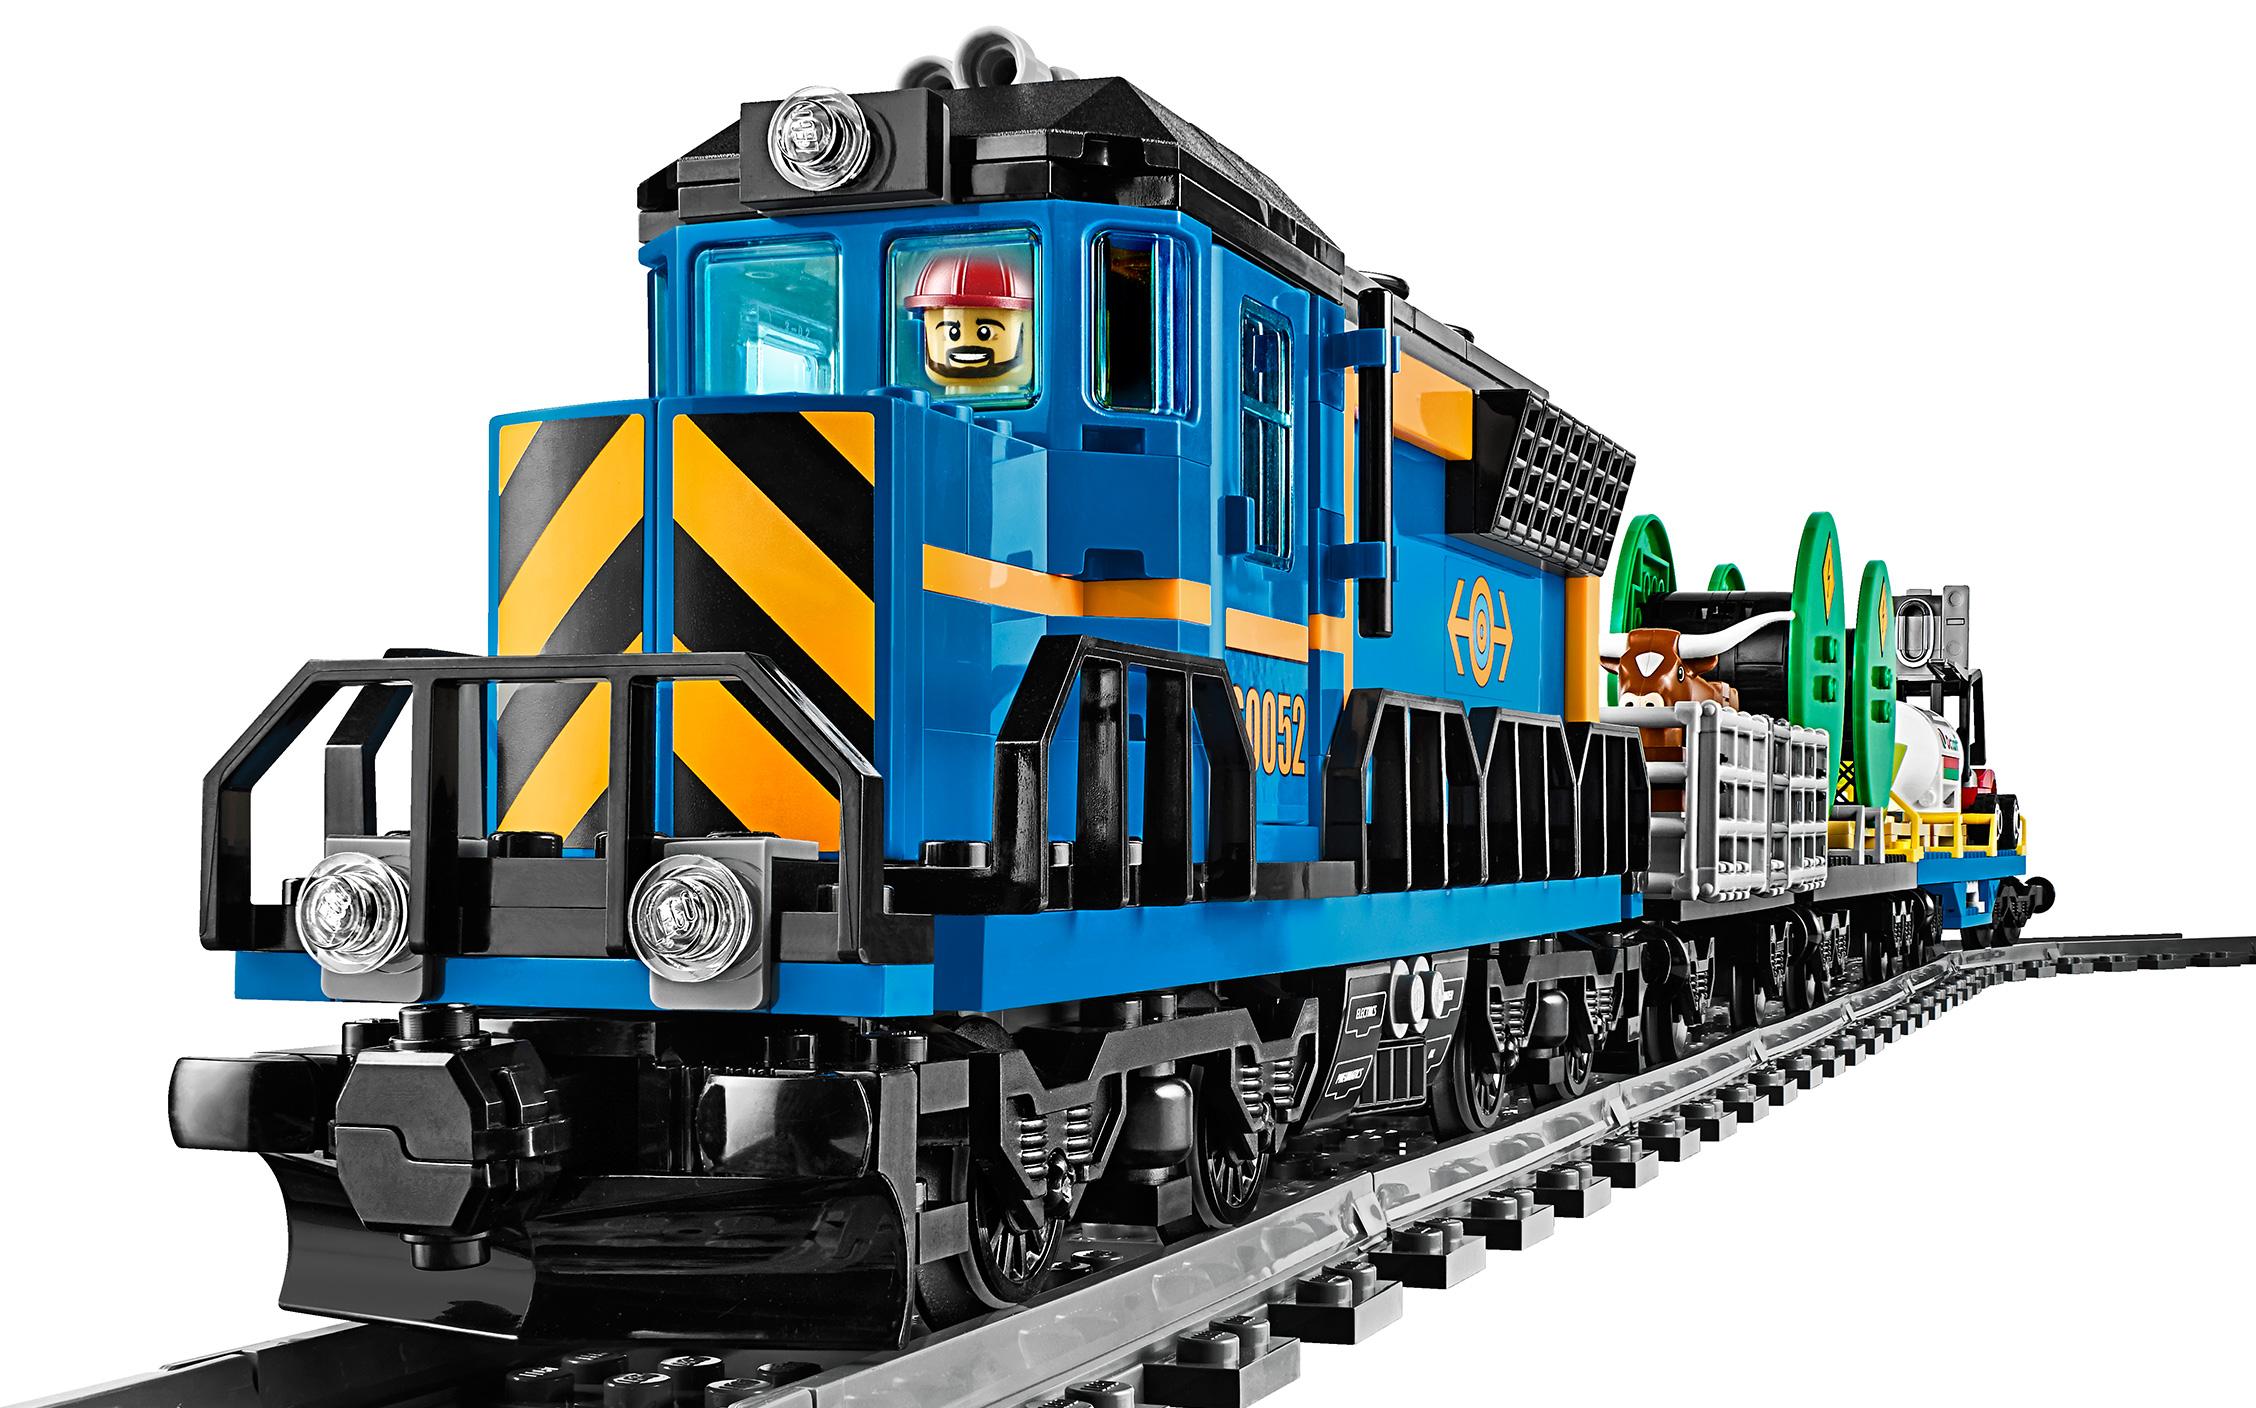 img2256x1408_Downloads_60052_Cargo Train.jpg